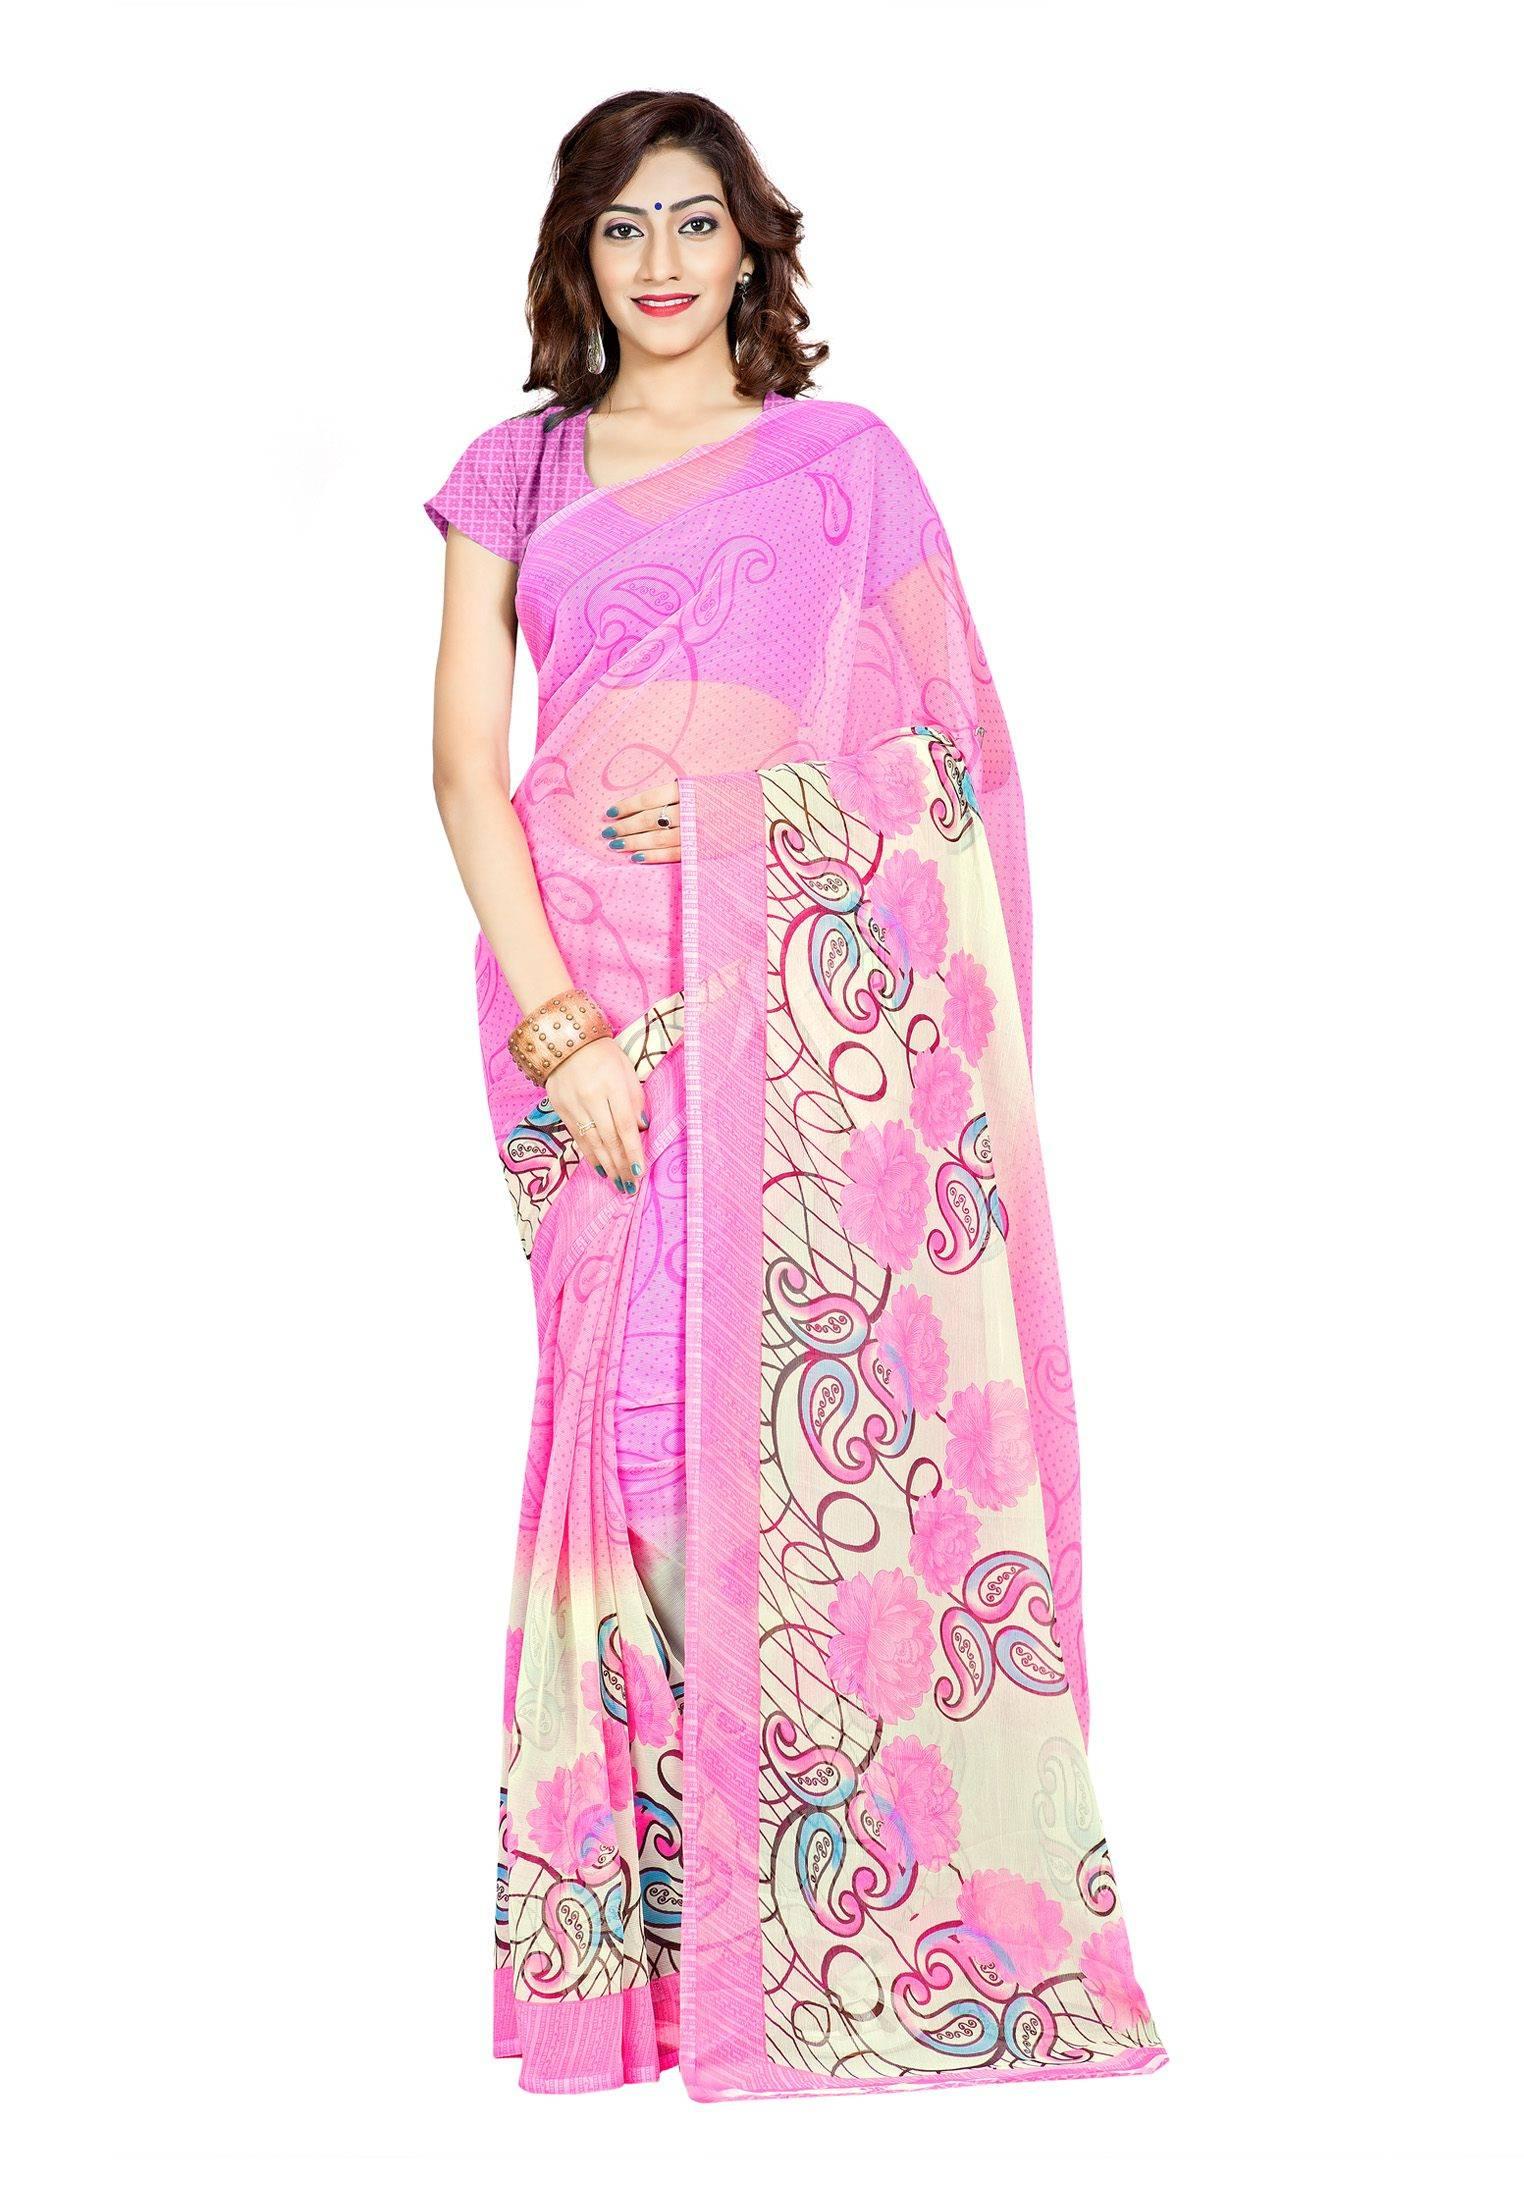 Ambaji Casual Wear Pink Colored Printed Chiffon Saree/Sari